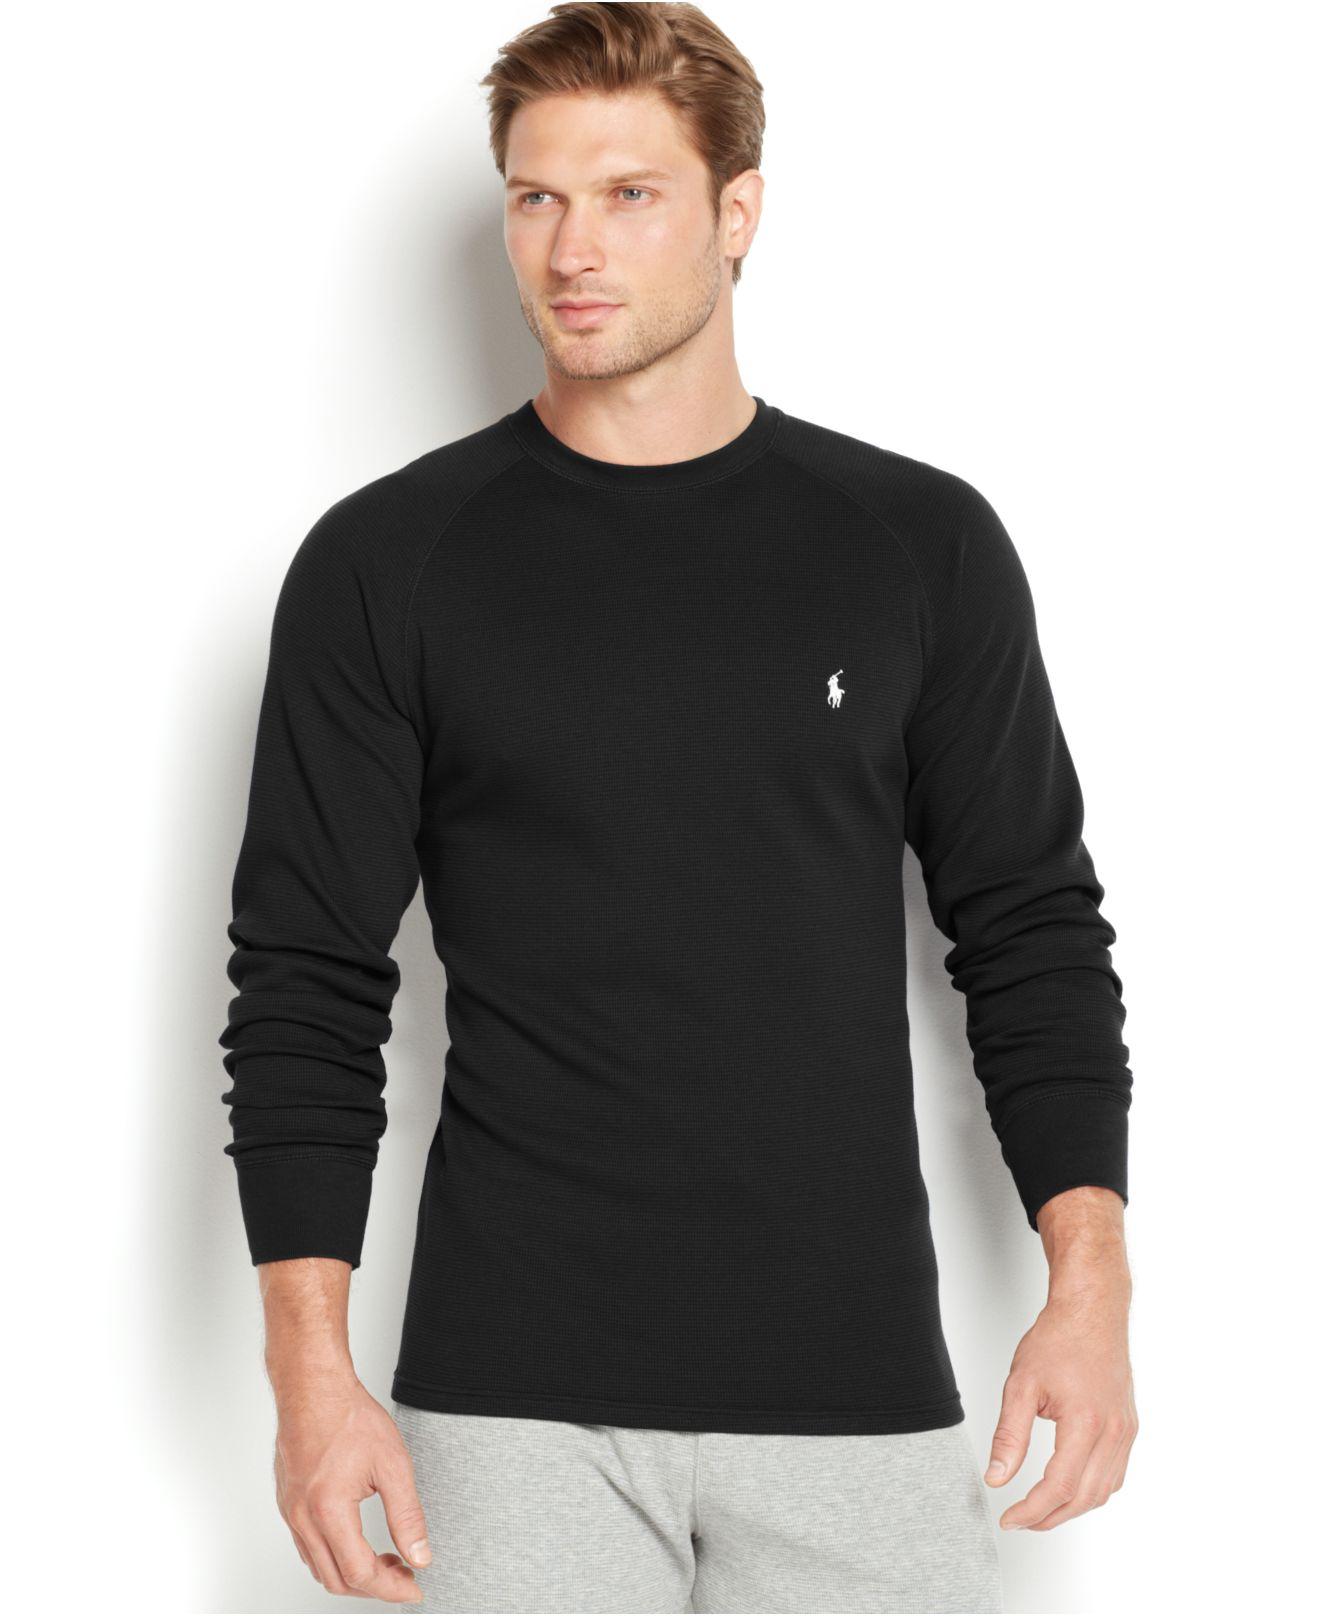 Lyst Polo Ralph Lauren Mens Thermal Raglan Crew Neck Shirt In